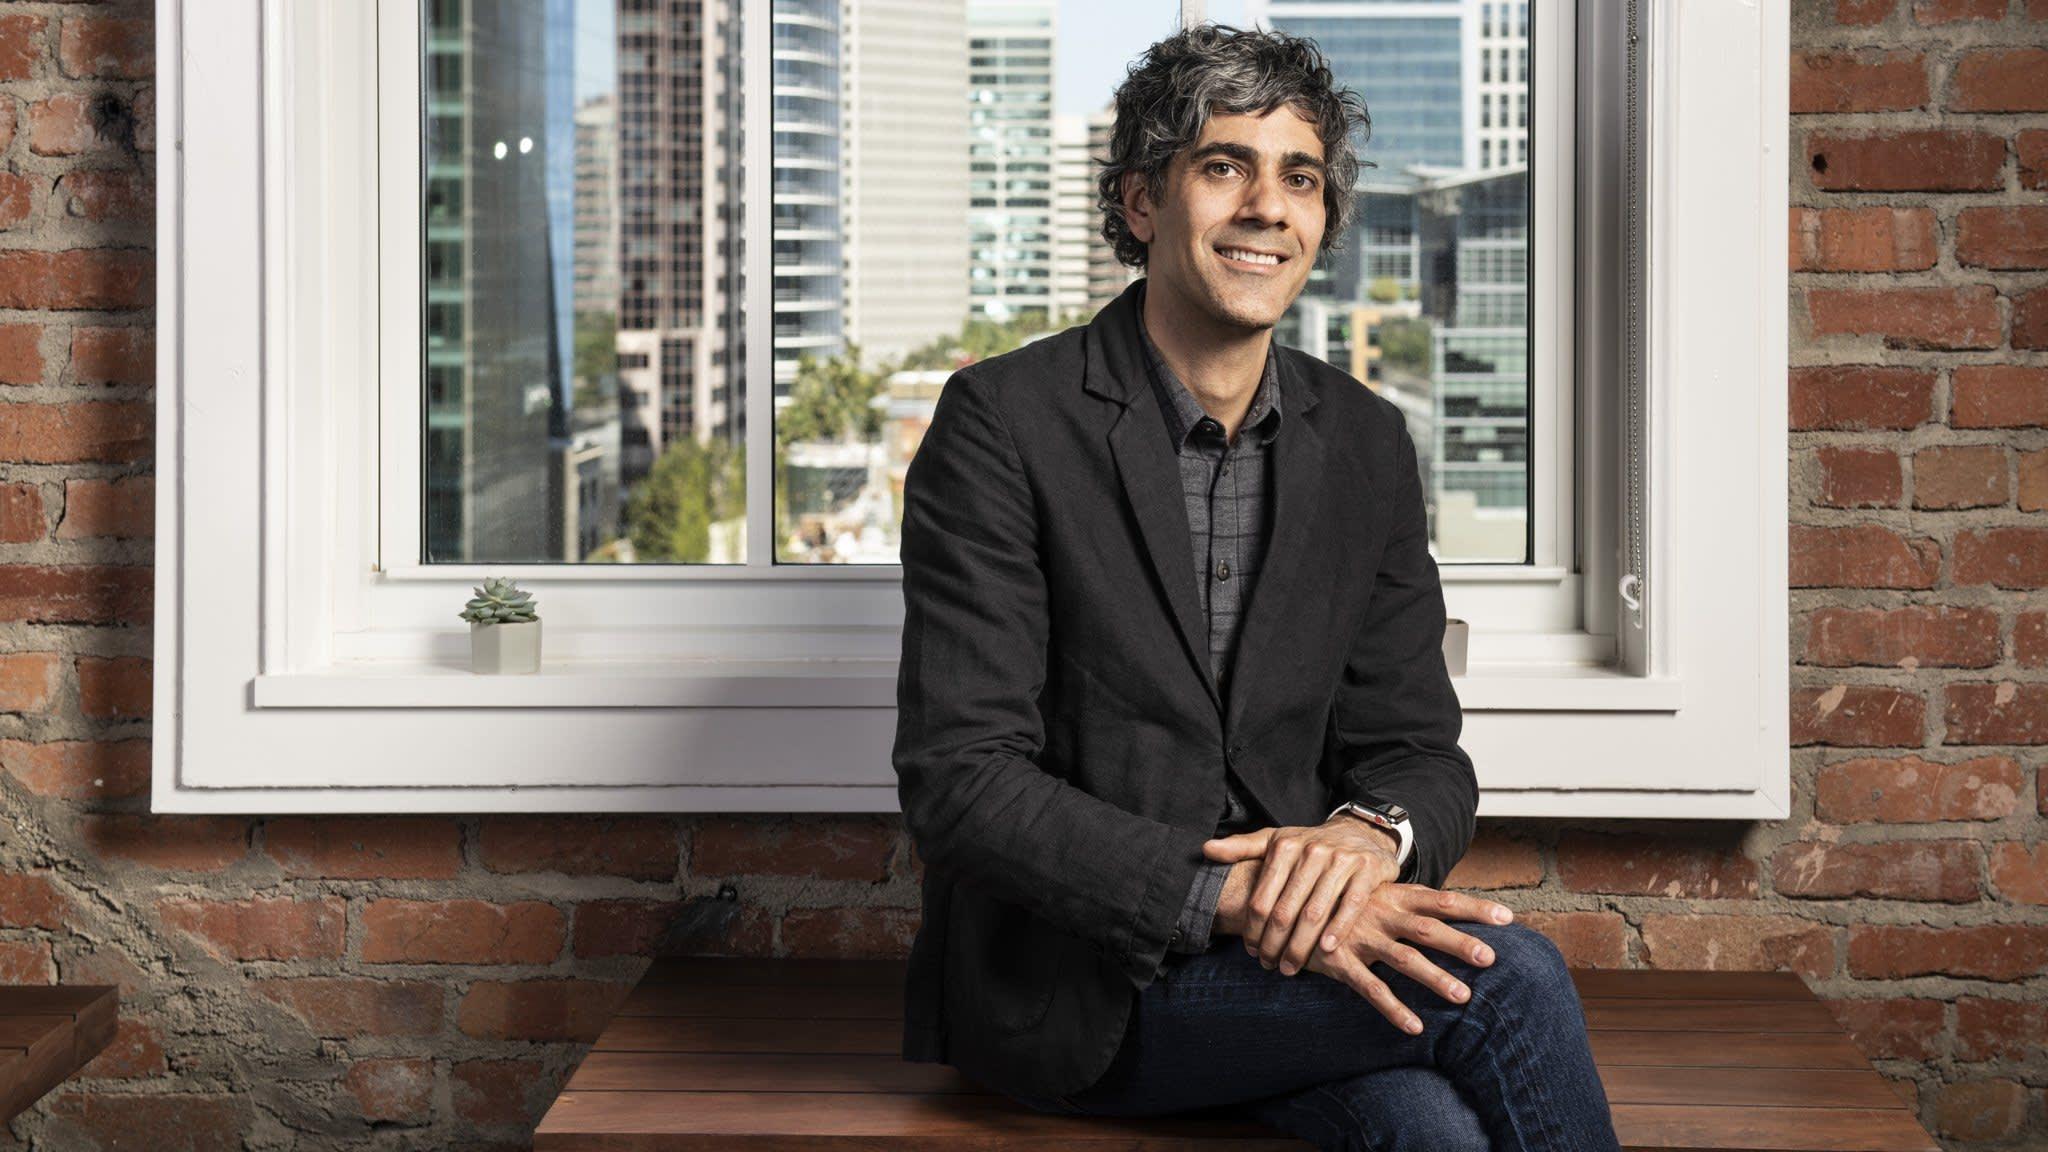 Yelp's Jeremy Stoppelman on his Big Tech fightback